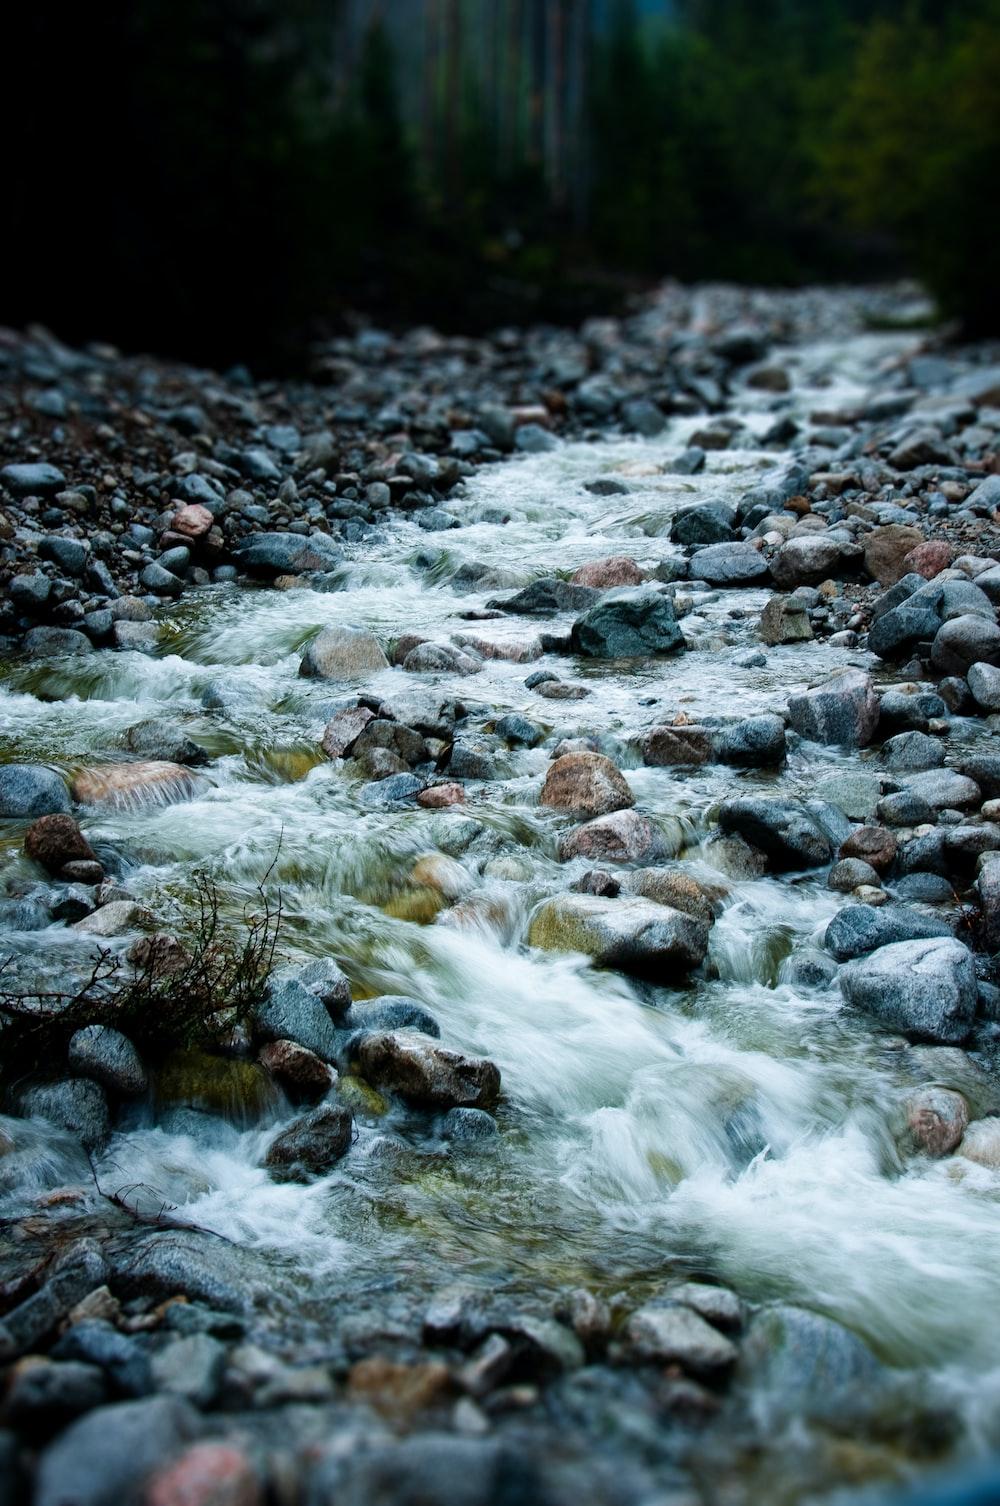 water flowing on rocky shore